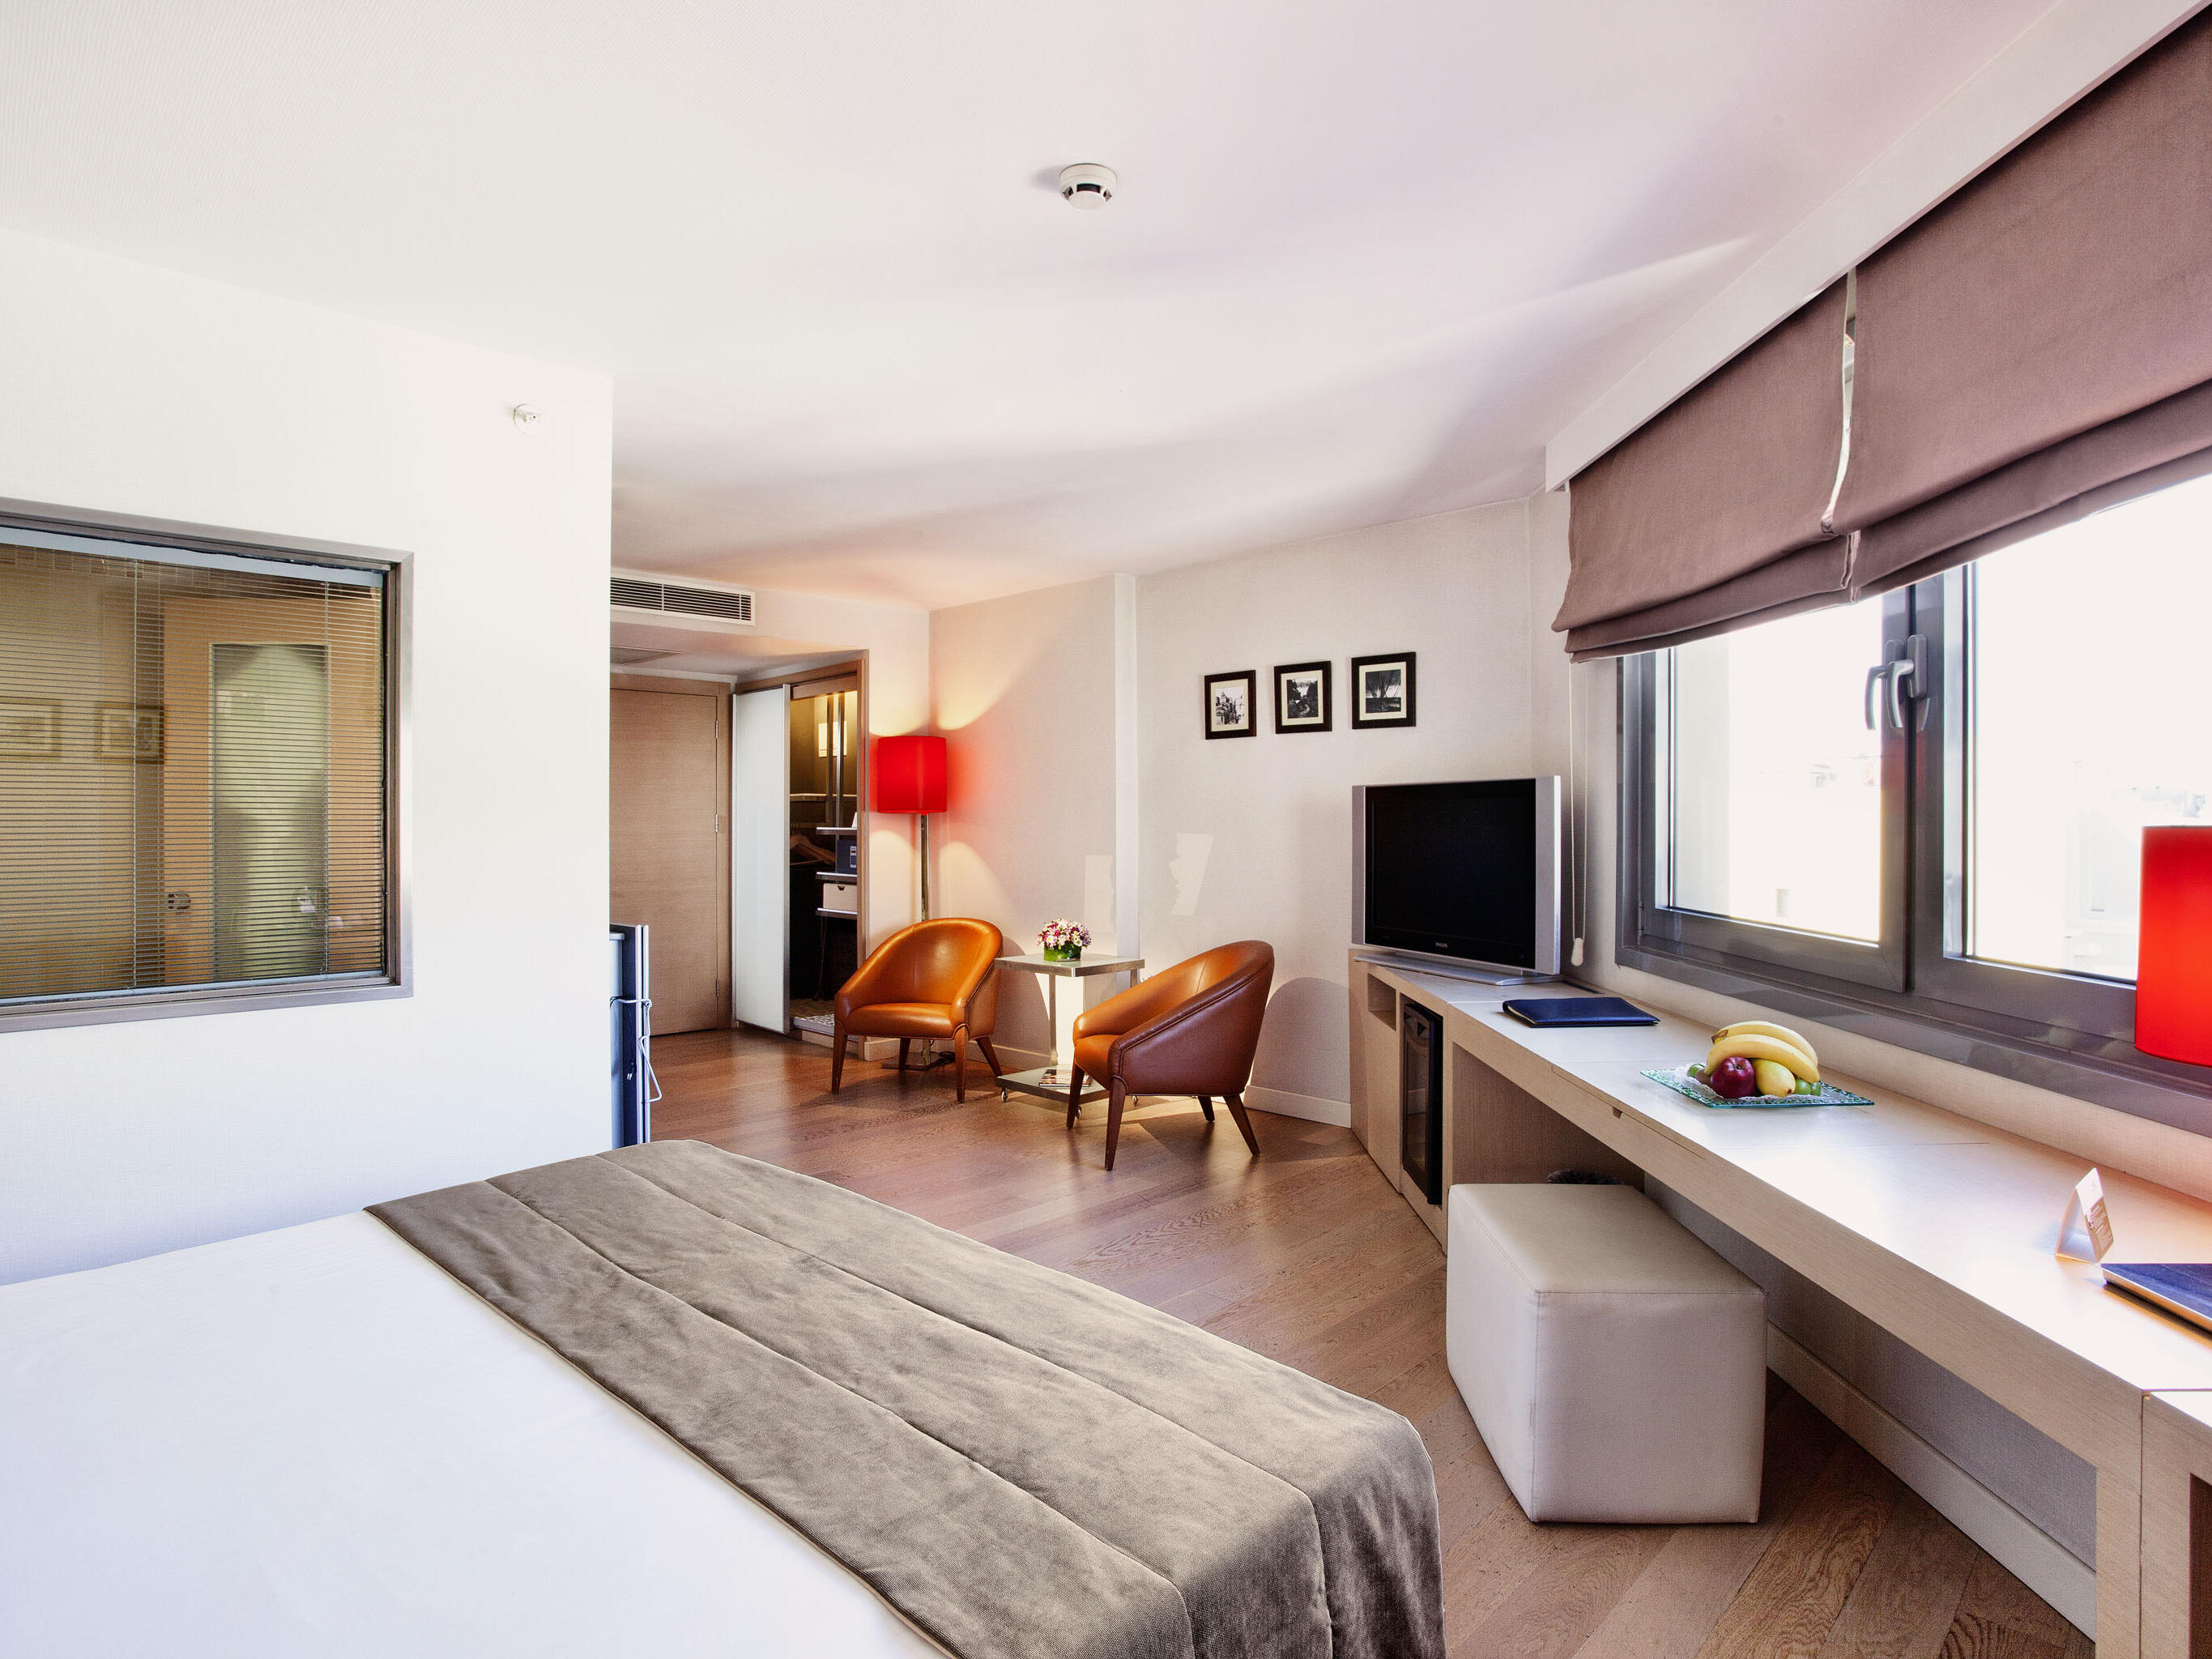 Singlr bed room at Eresin taxim premier.